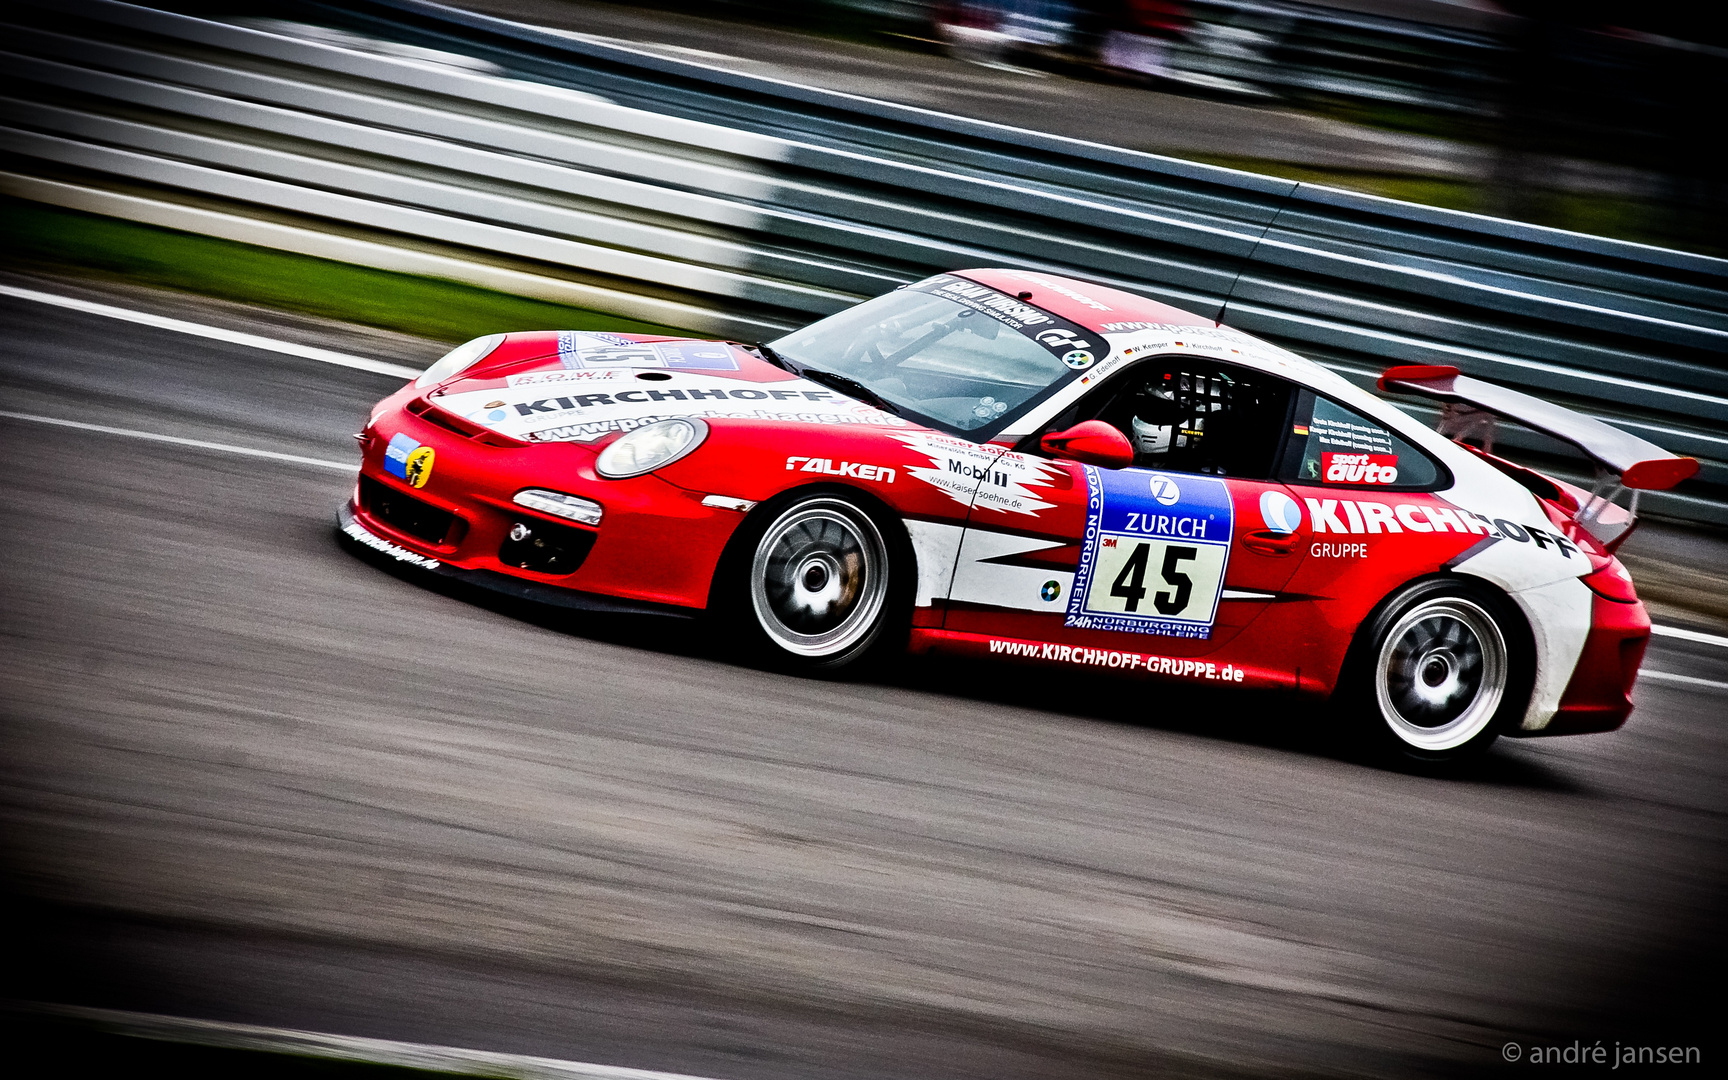 Kirchhoff Porsche Nürburgring 2011